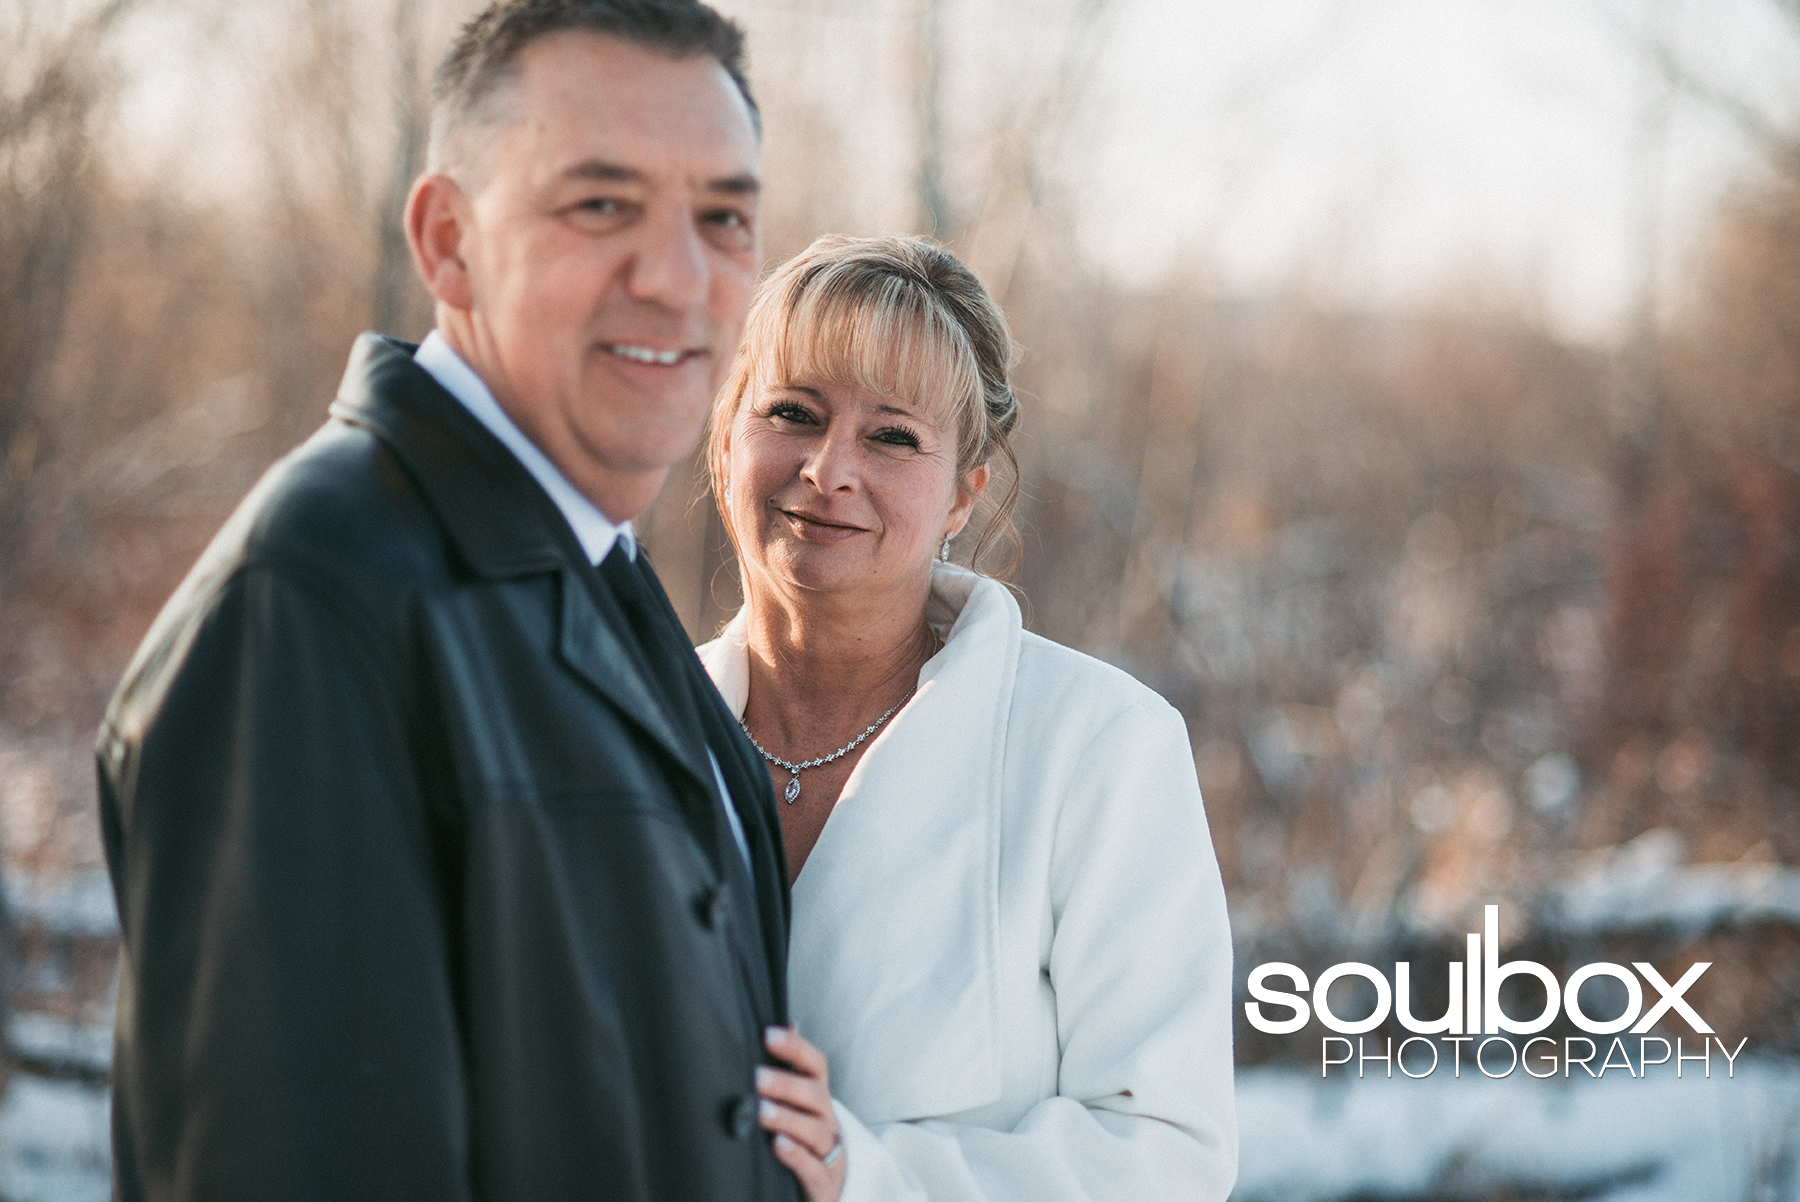 SoulboxPhotography-WinterWedding-5.jpg